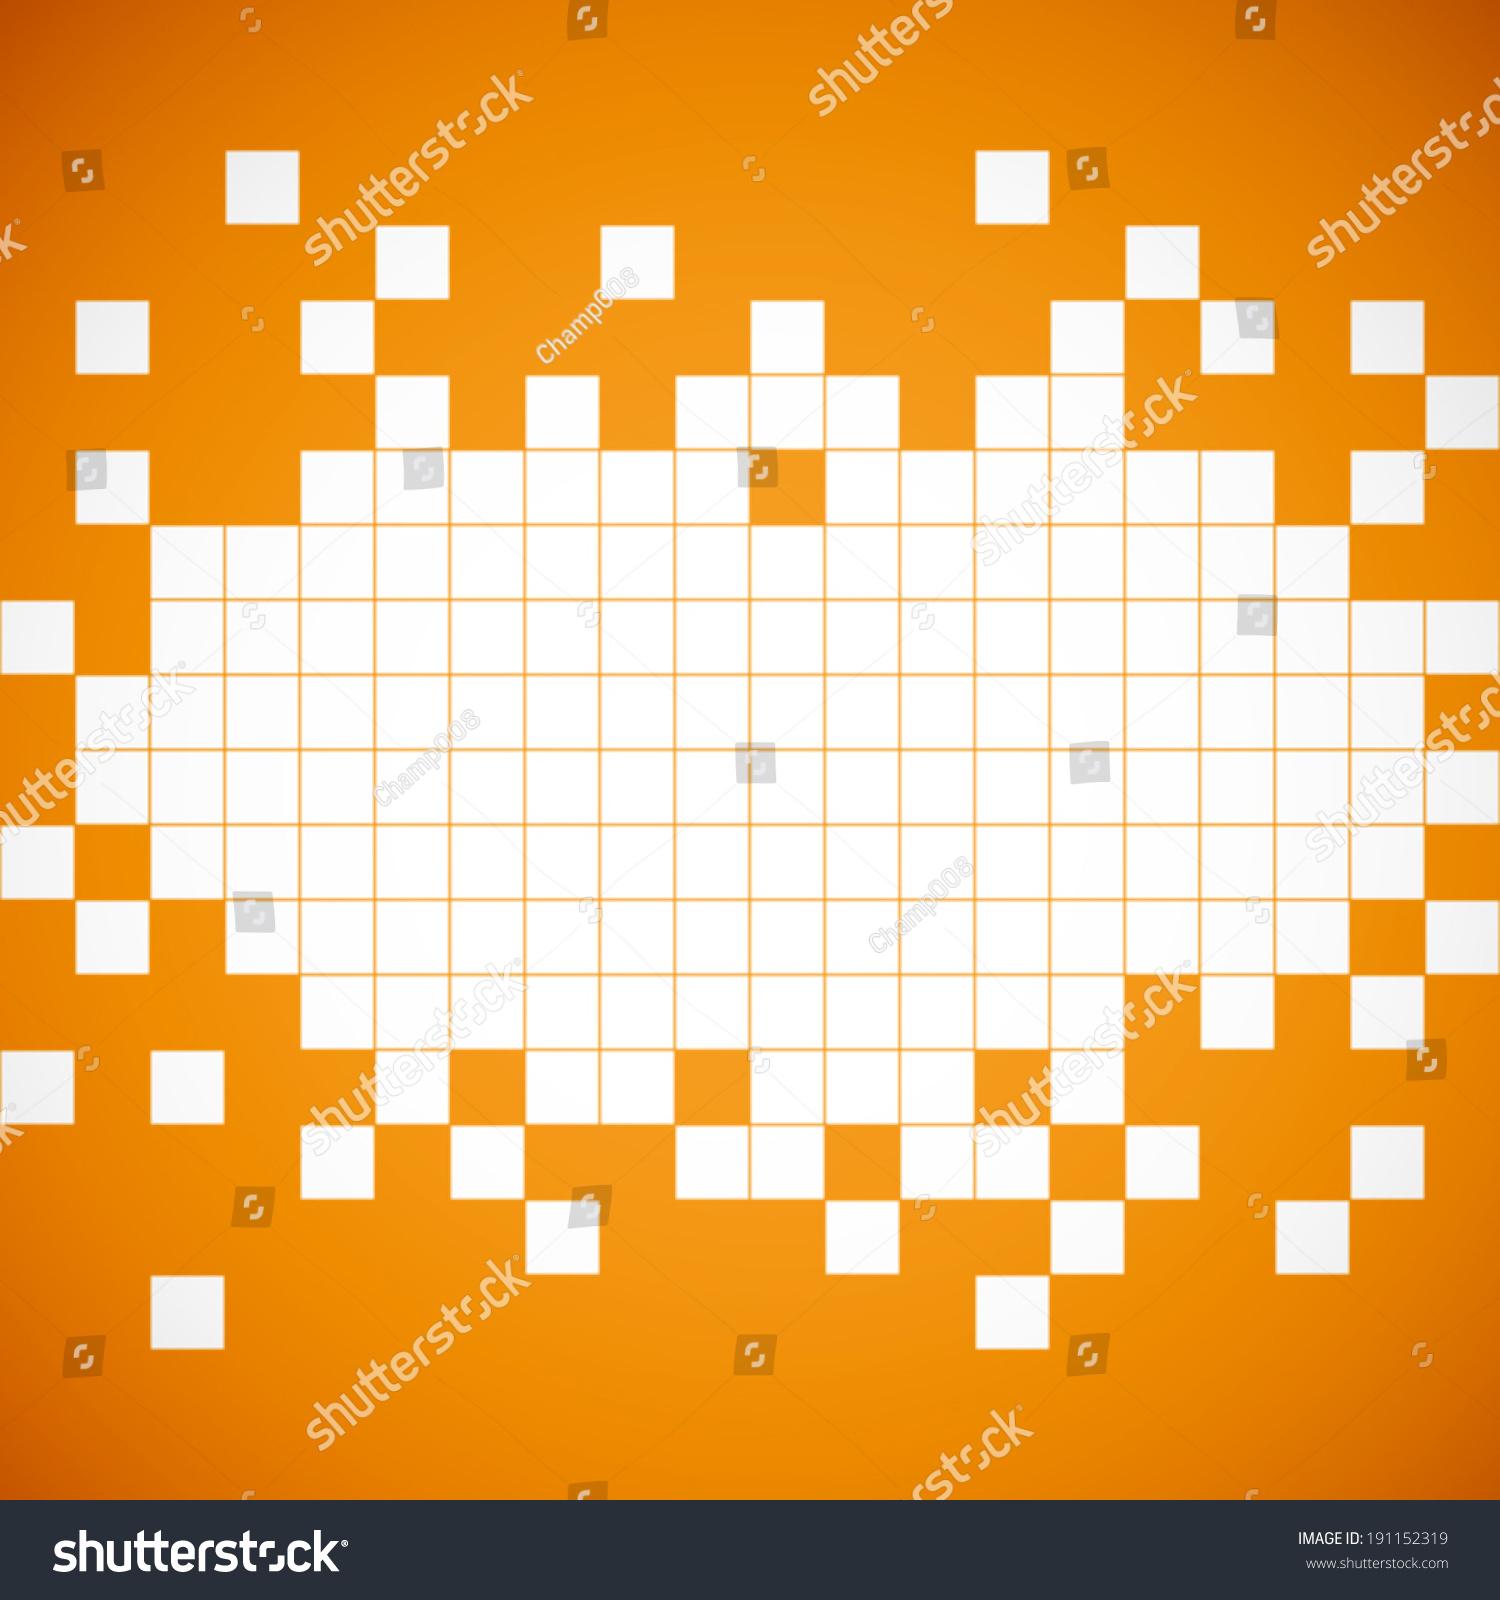 Orange And White Pattern Background